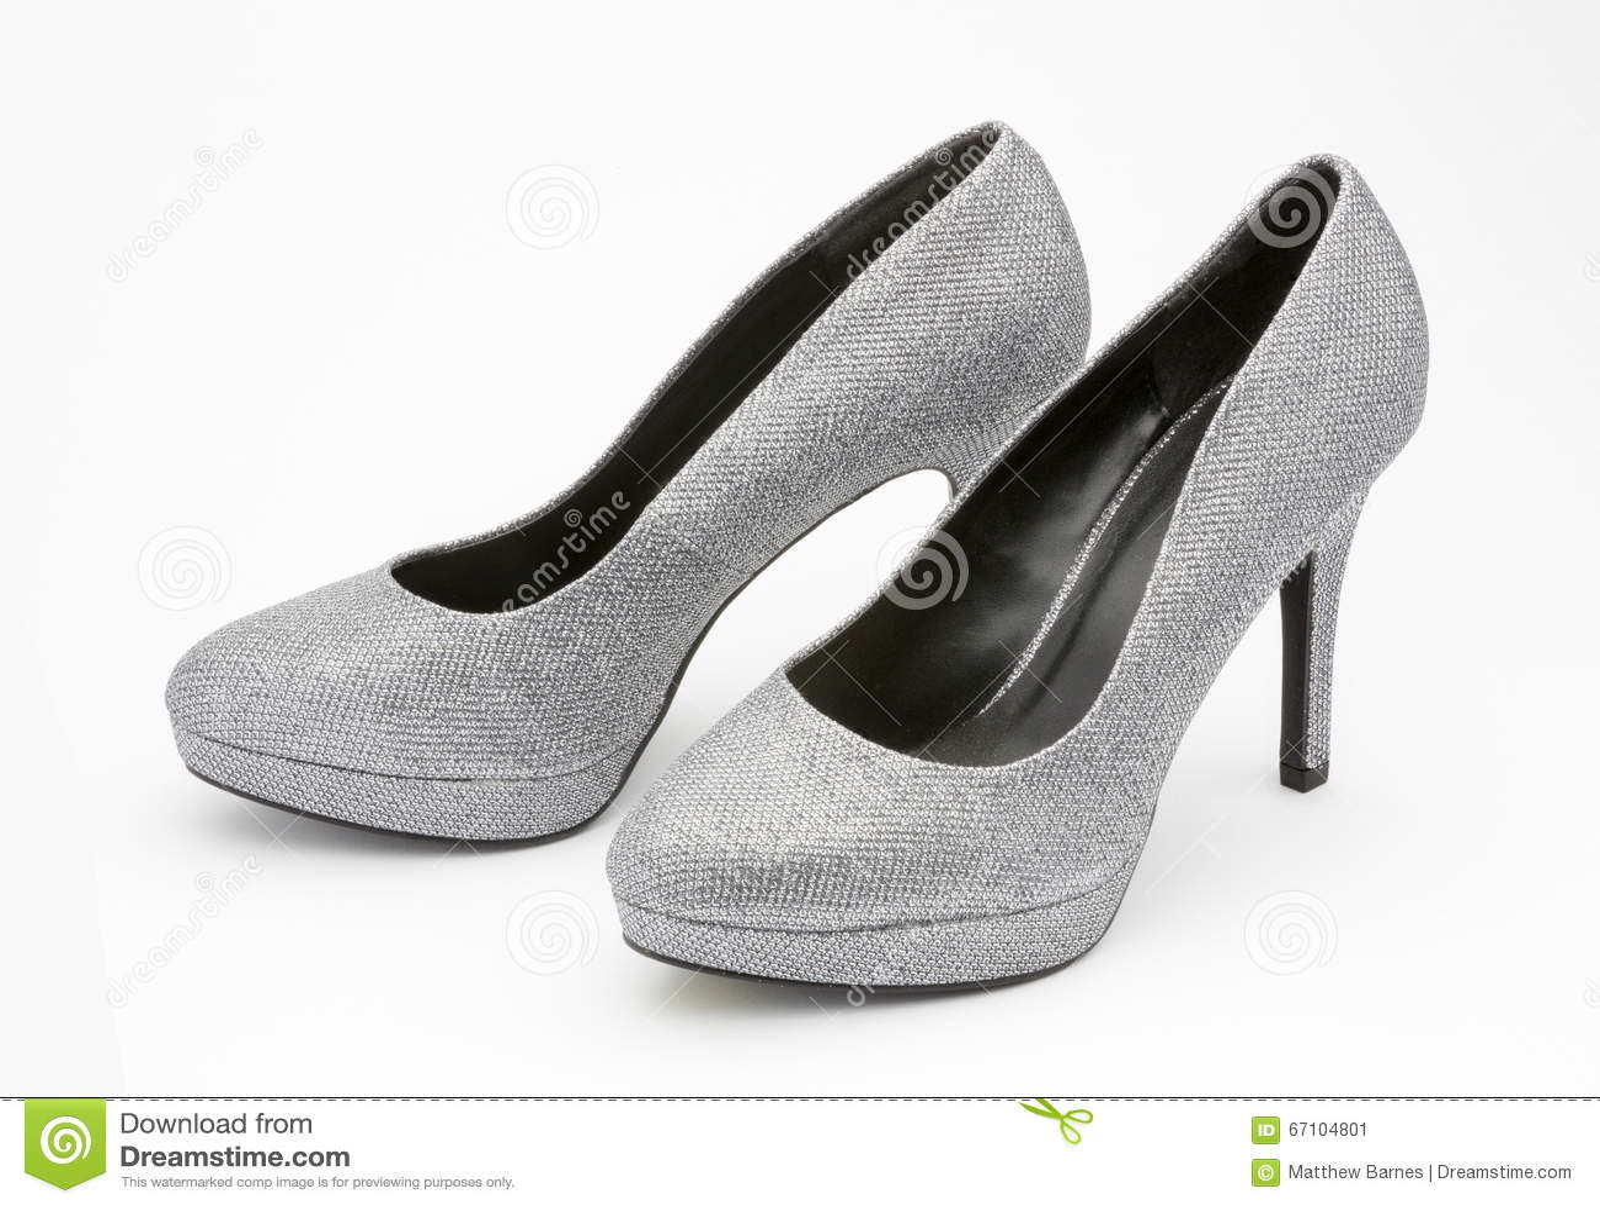 e1af0da640f Ασημένια υψηλά βαλμένα τακούνια παπούτσια glittery που απομονώνονται σε ένα  άσπρο υπόβαθρο